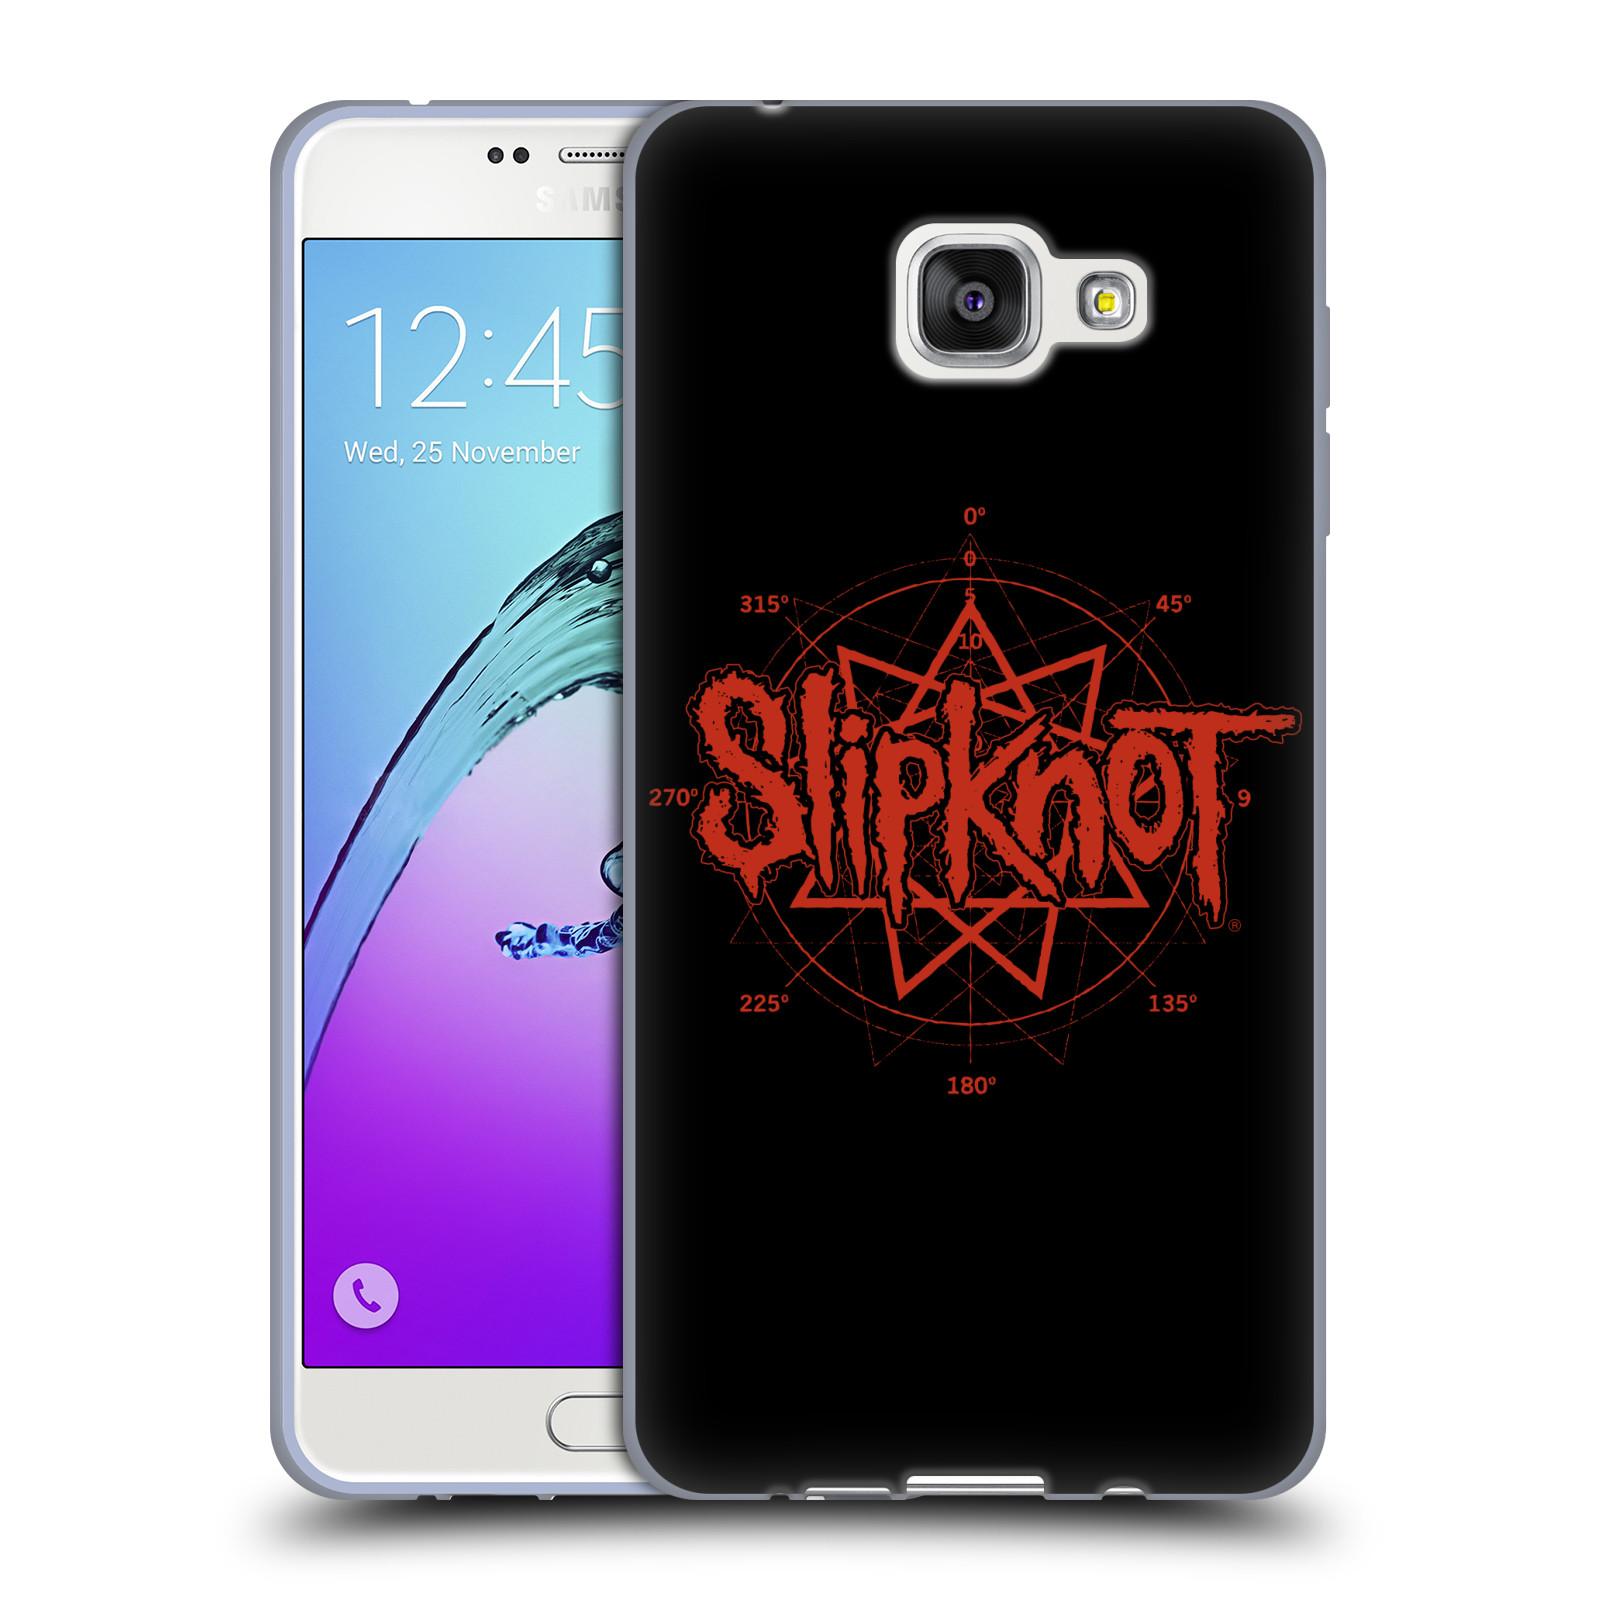 HEAD CASE silikonový obal na mobil Samsung Galaxy A7 2016 (A710) hudební skupina Slipknot logo